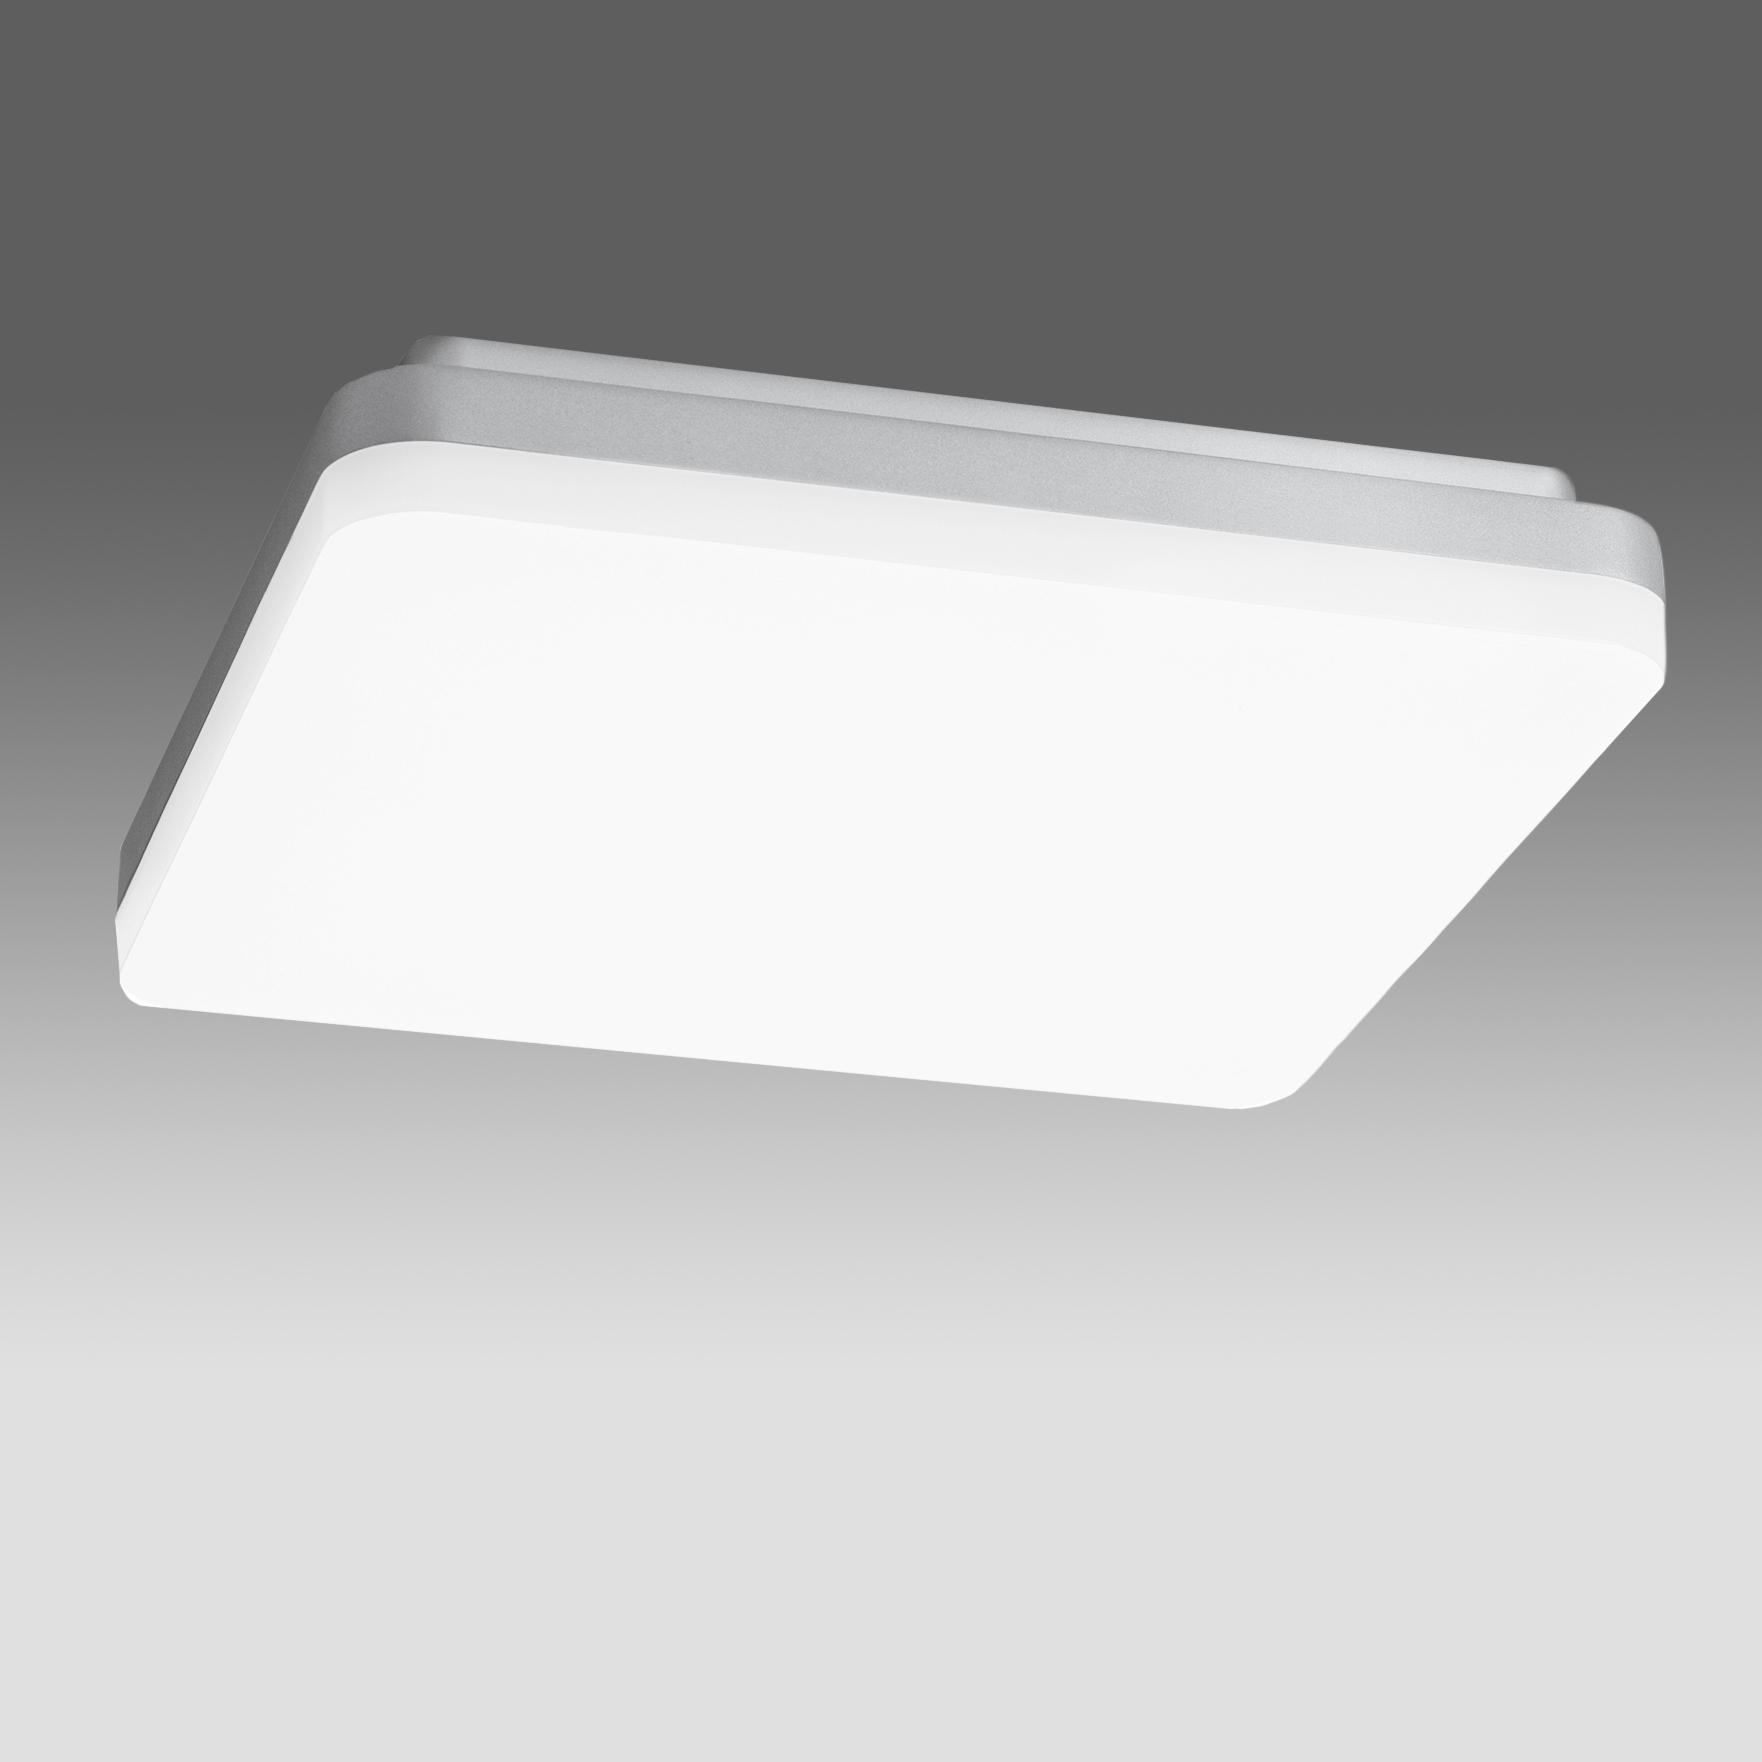 1 Stk Elegance Square II 15W 1500lm 4000K Triac Dim IP44 silber LILE0032--